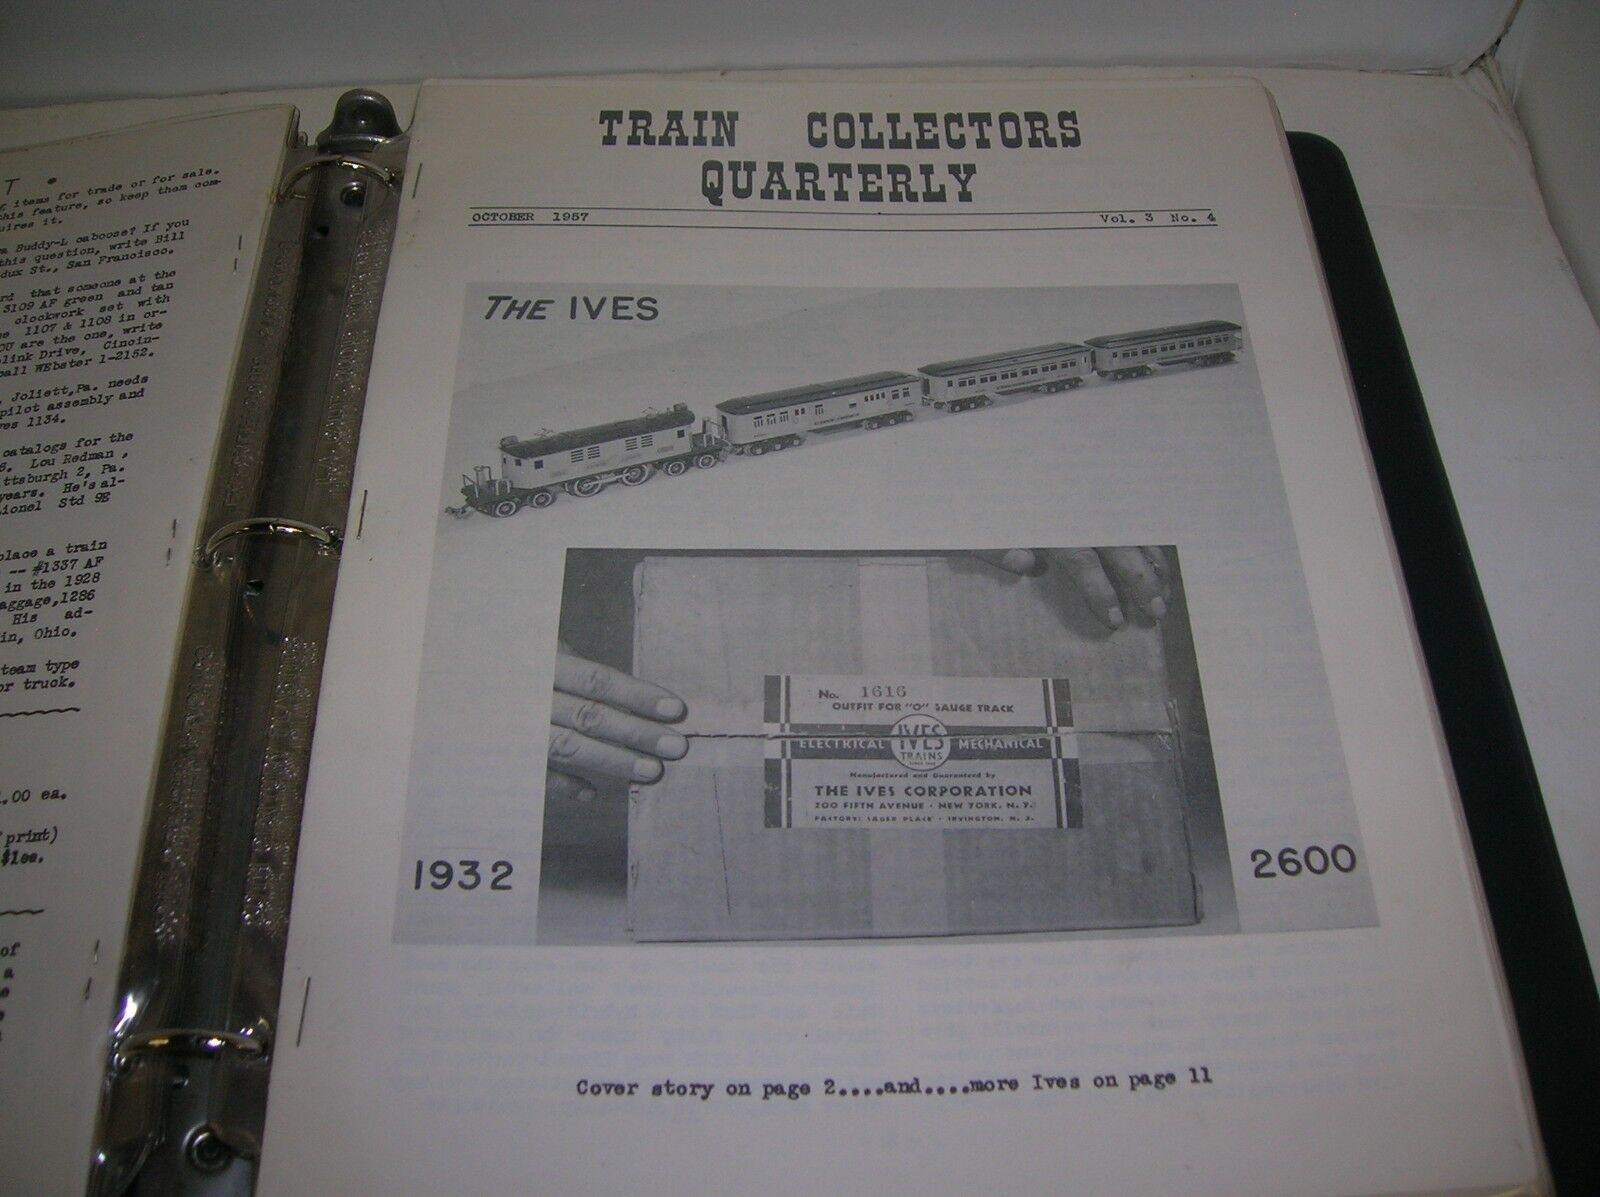 TRAIN COLLECTORS QUARTERLY NEWS LETTER OCTOBER 1957 VOL. 3 NO. 4- MAKE OFFERS